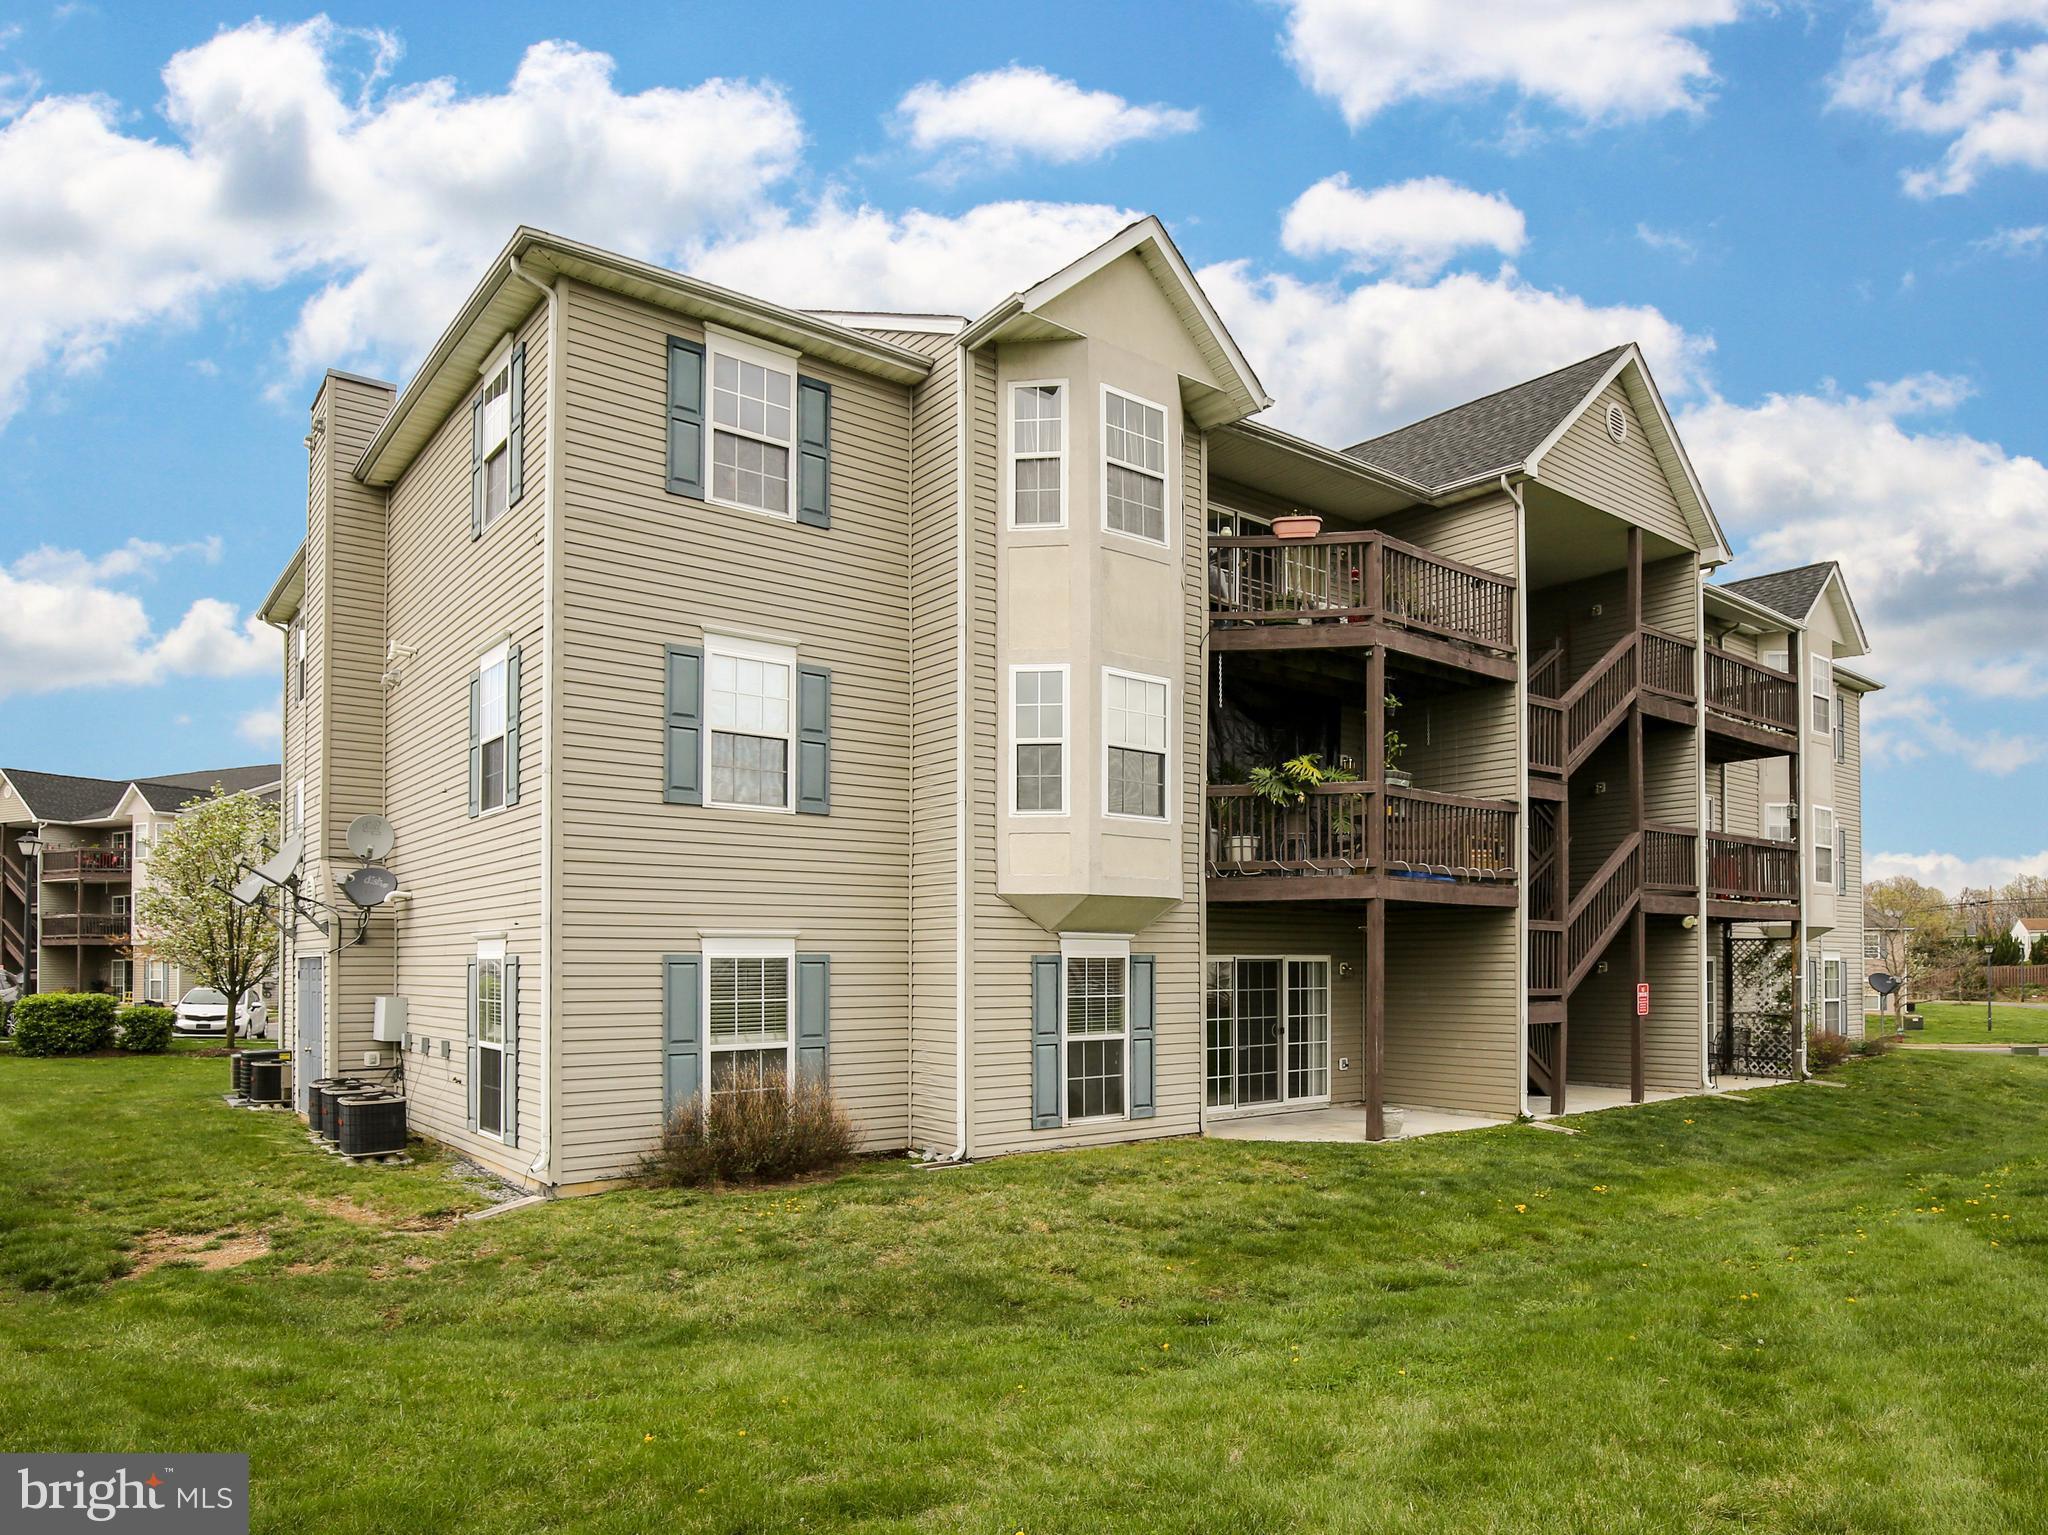 164-3 Brookland Ct, Winchester, VA, 22602